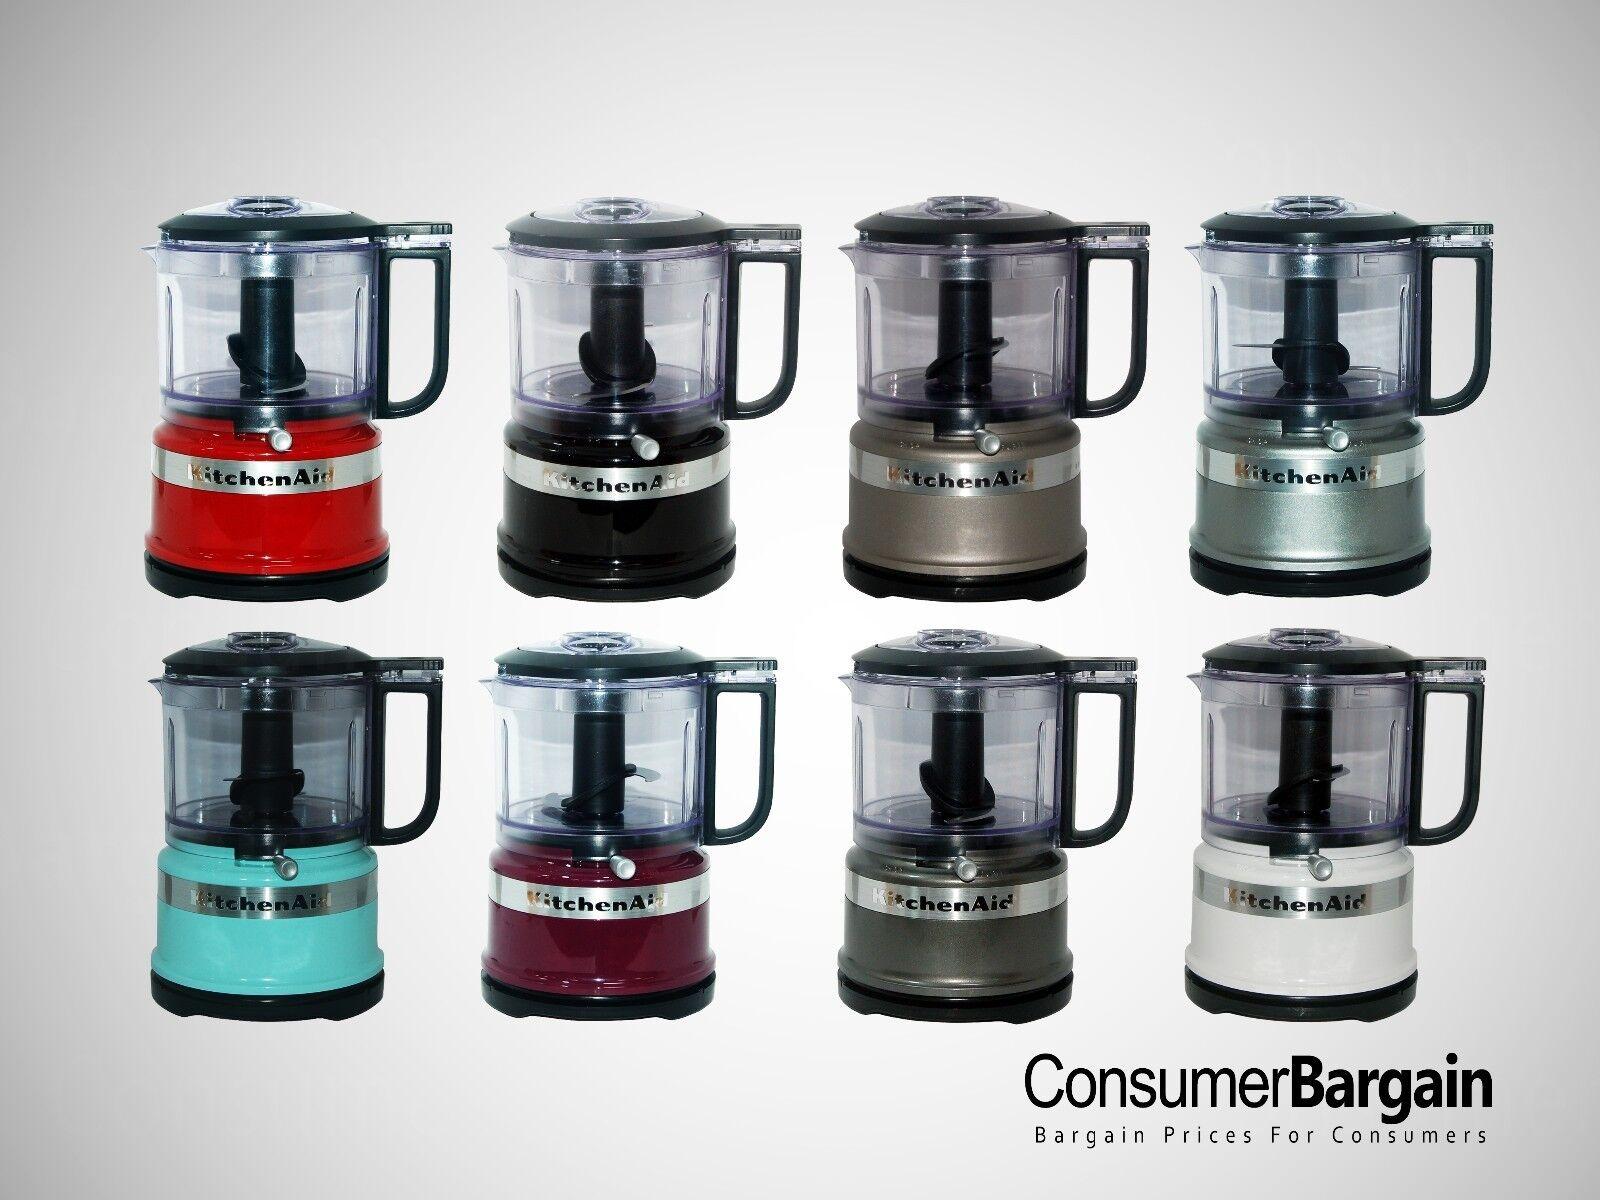 KitchenAid KFC3516 3.5 Cup Mini Food Processor Guaranteed Refurbished BPA-Free!!